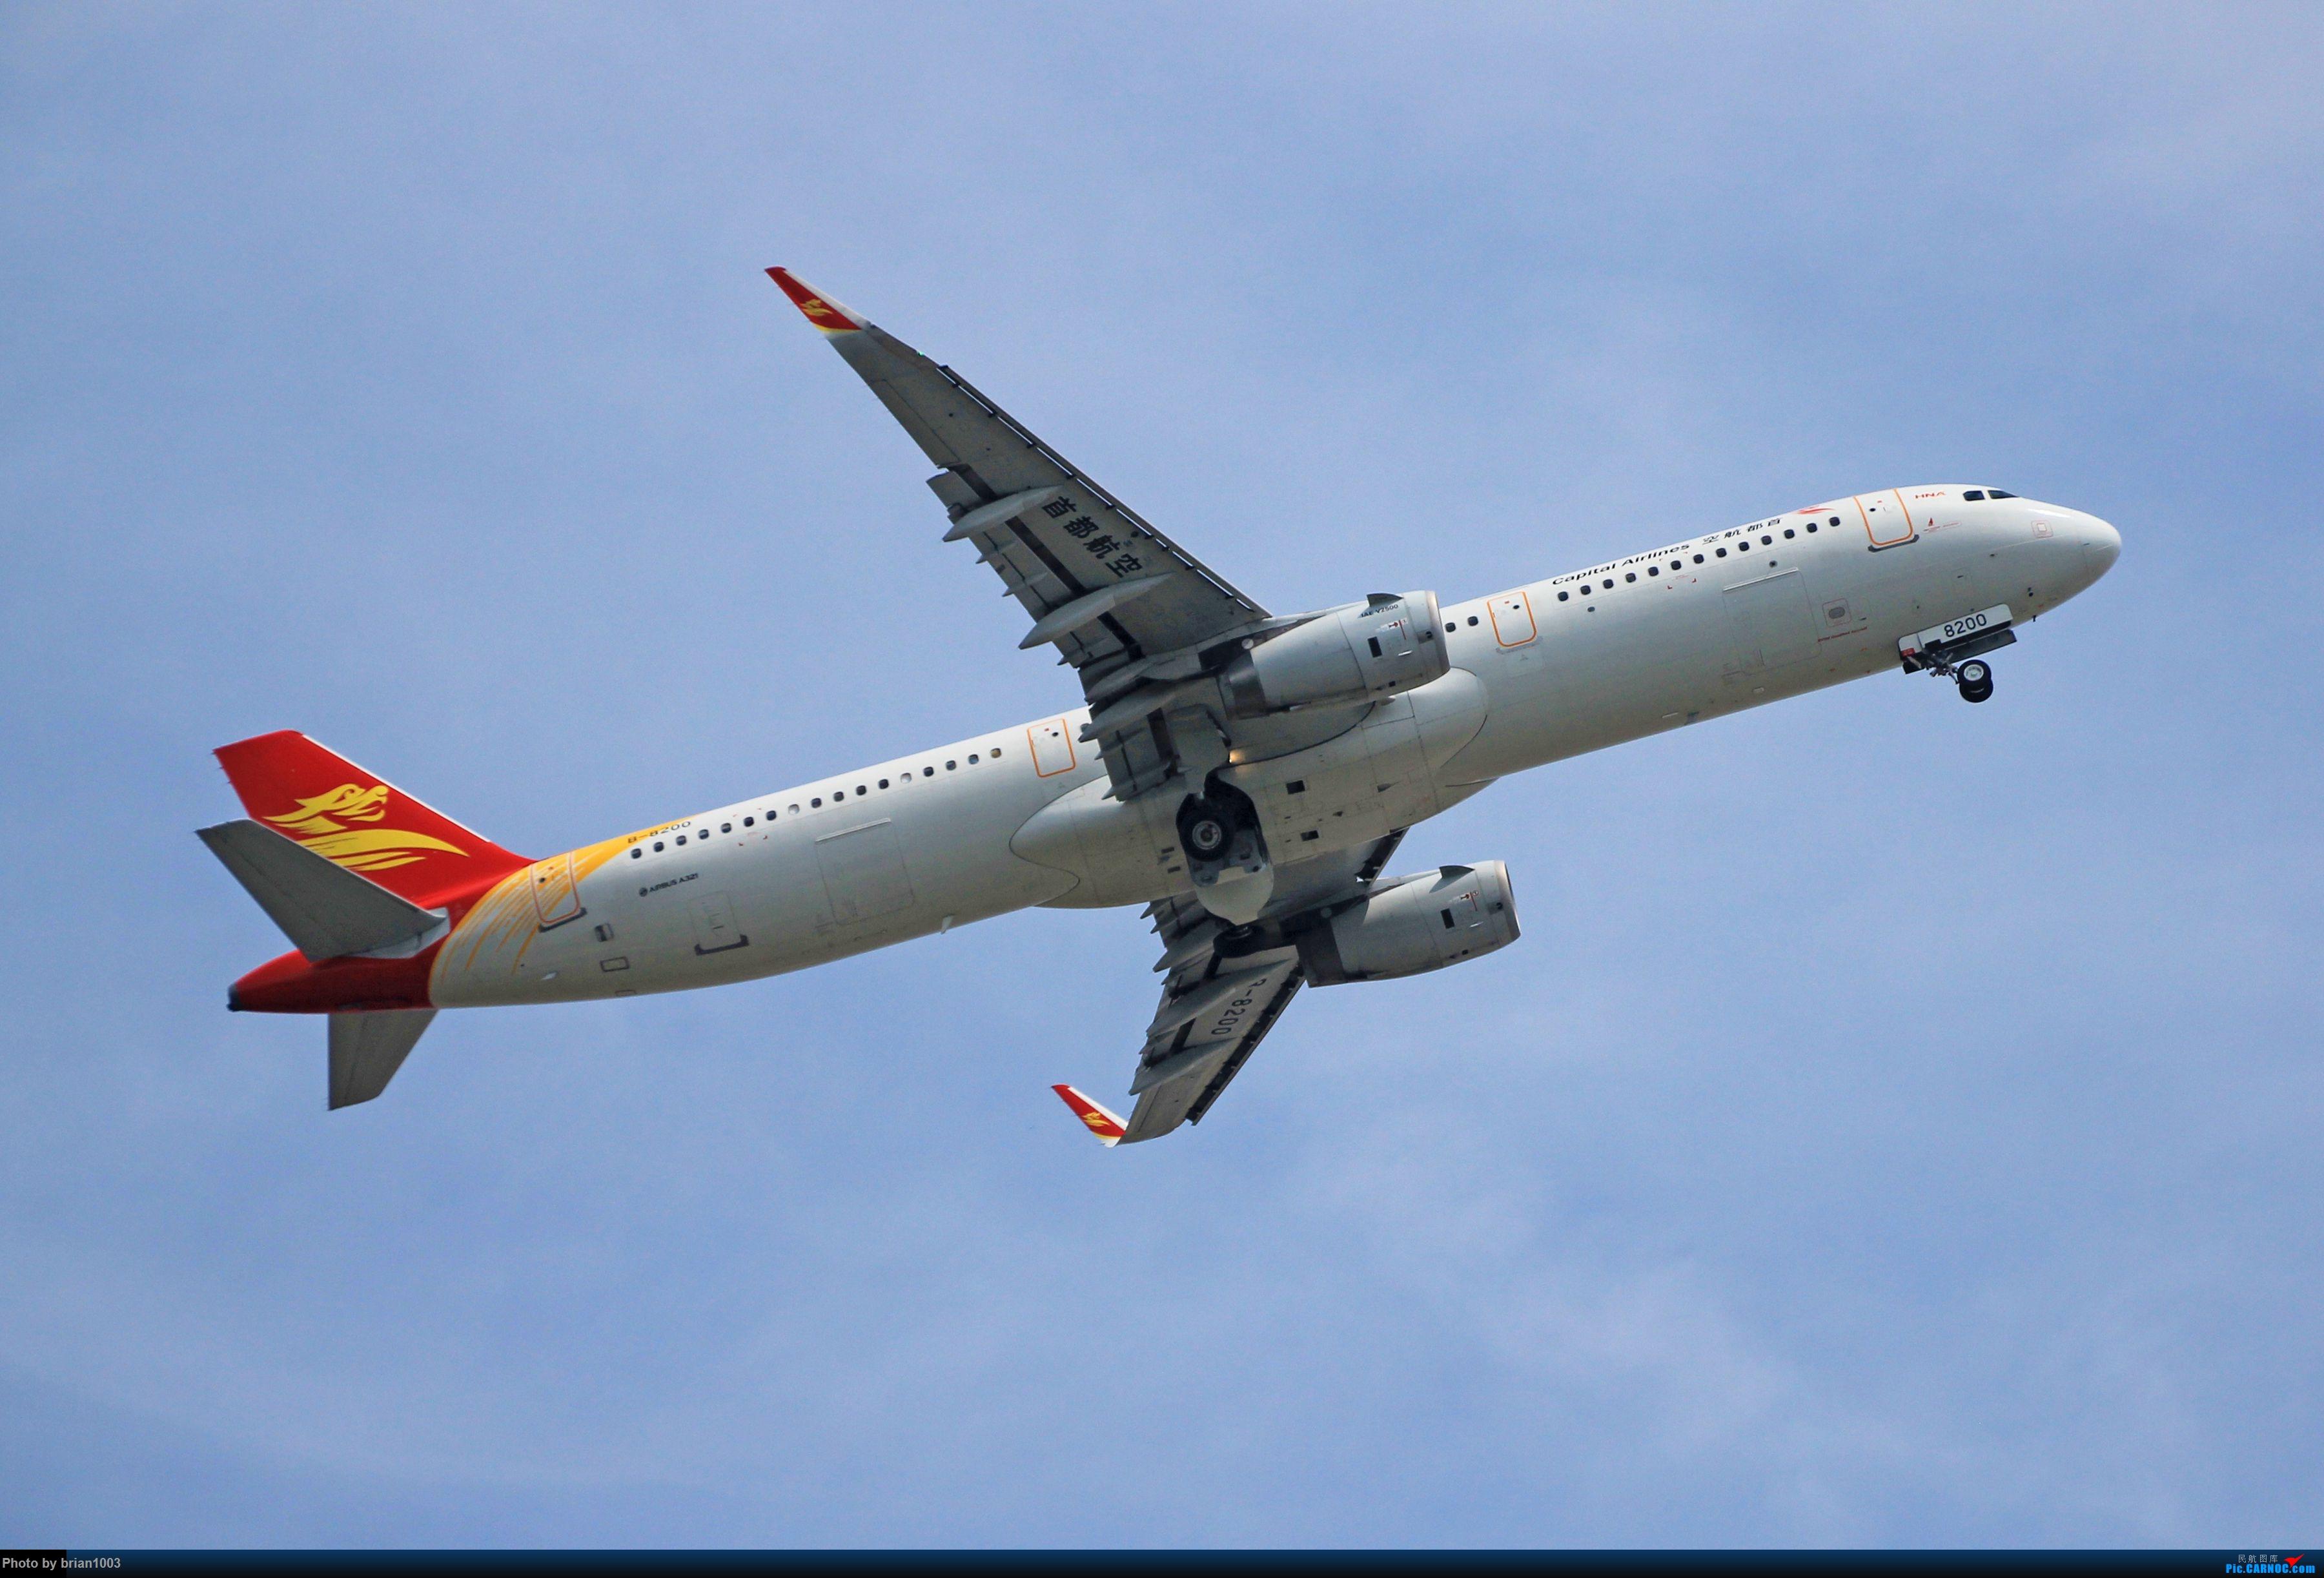 Re:[原创]WUH天河机场拍机之六月还有啥(X7家744F、天津大韩港龙333、巴基斯坦772、B6419、ER-BBJ 74F、某菊塞斯纳、俄航国航77W) AIRBUS A321-200 B-8200 中国武汉天河国际机场